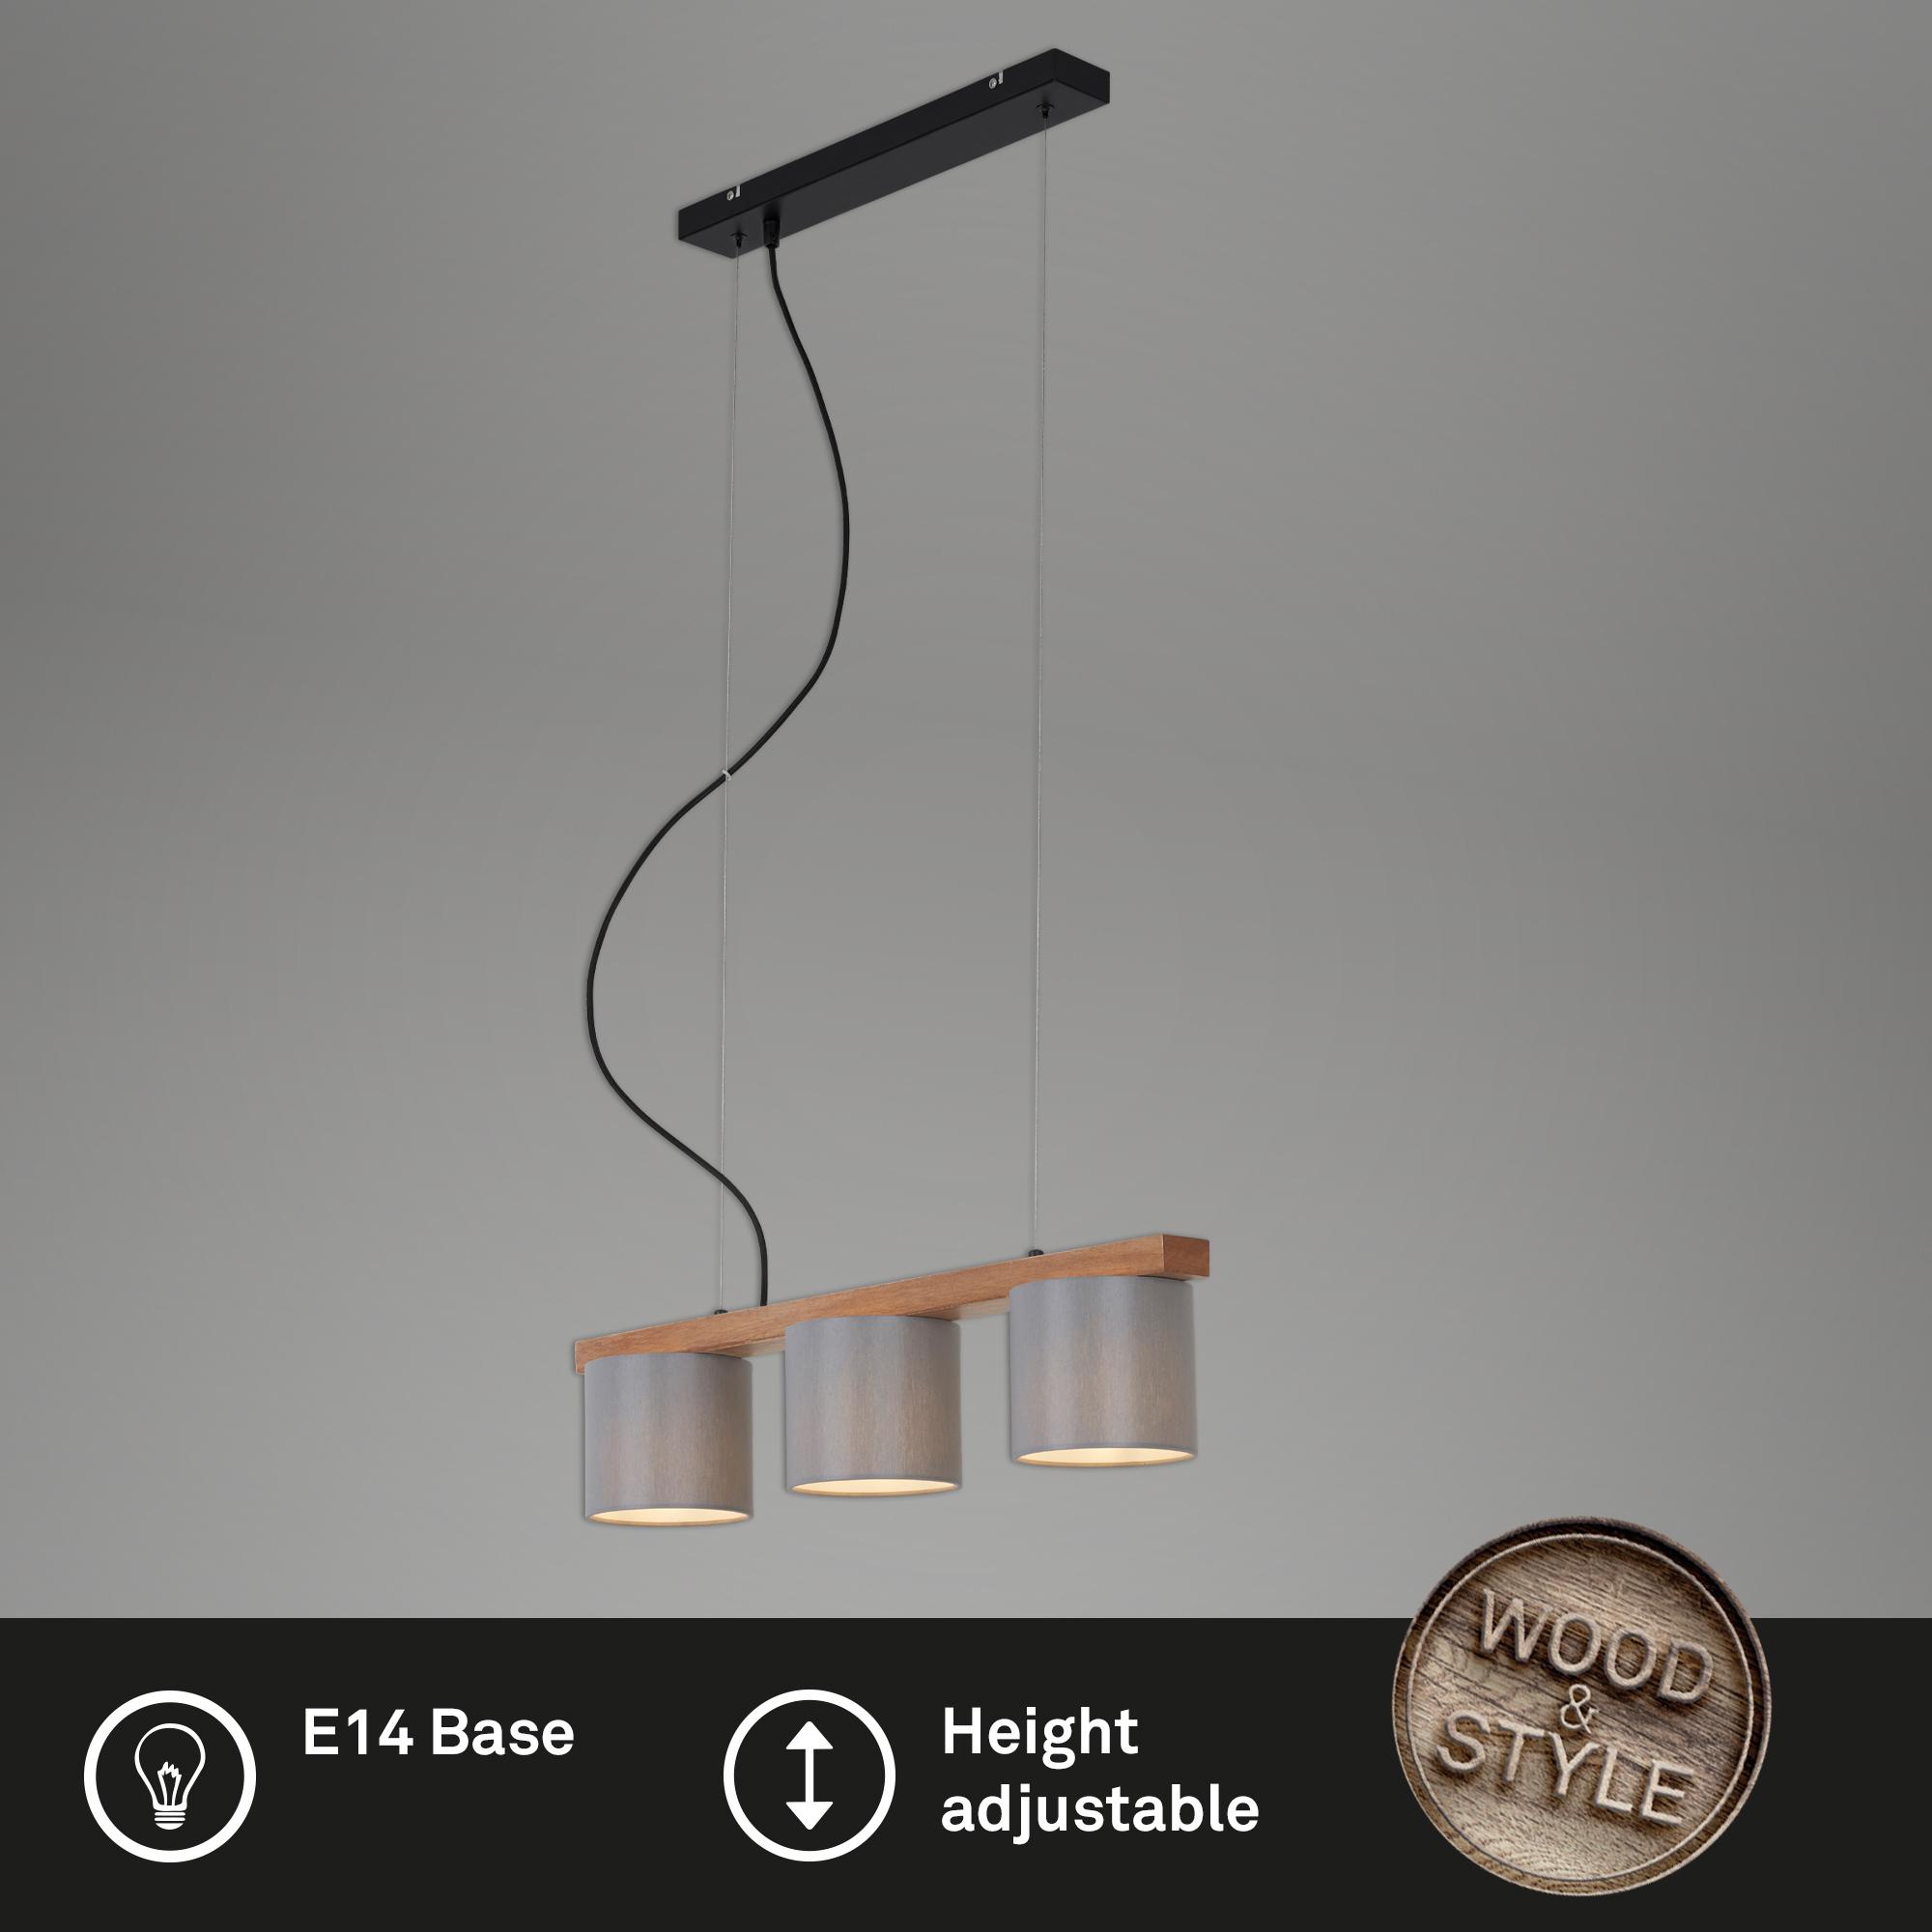 LED Pendelleuchte, 65 cm, max. 25 W, Grau